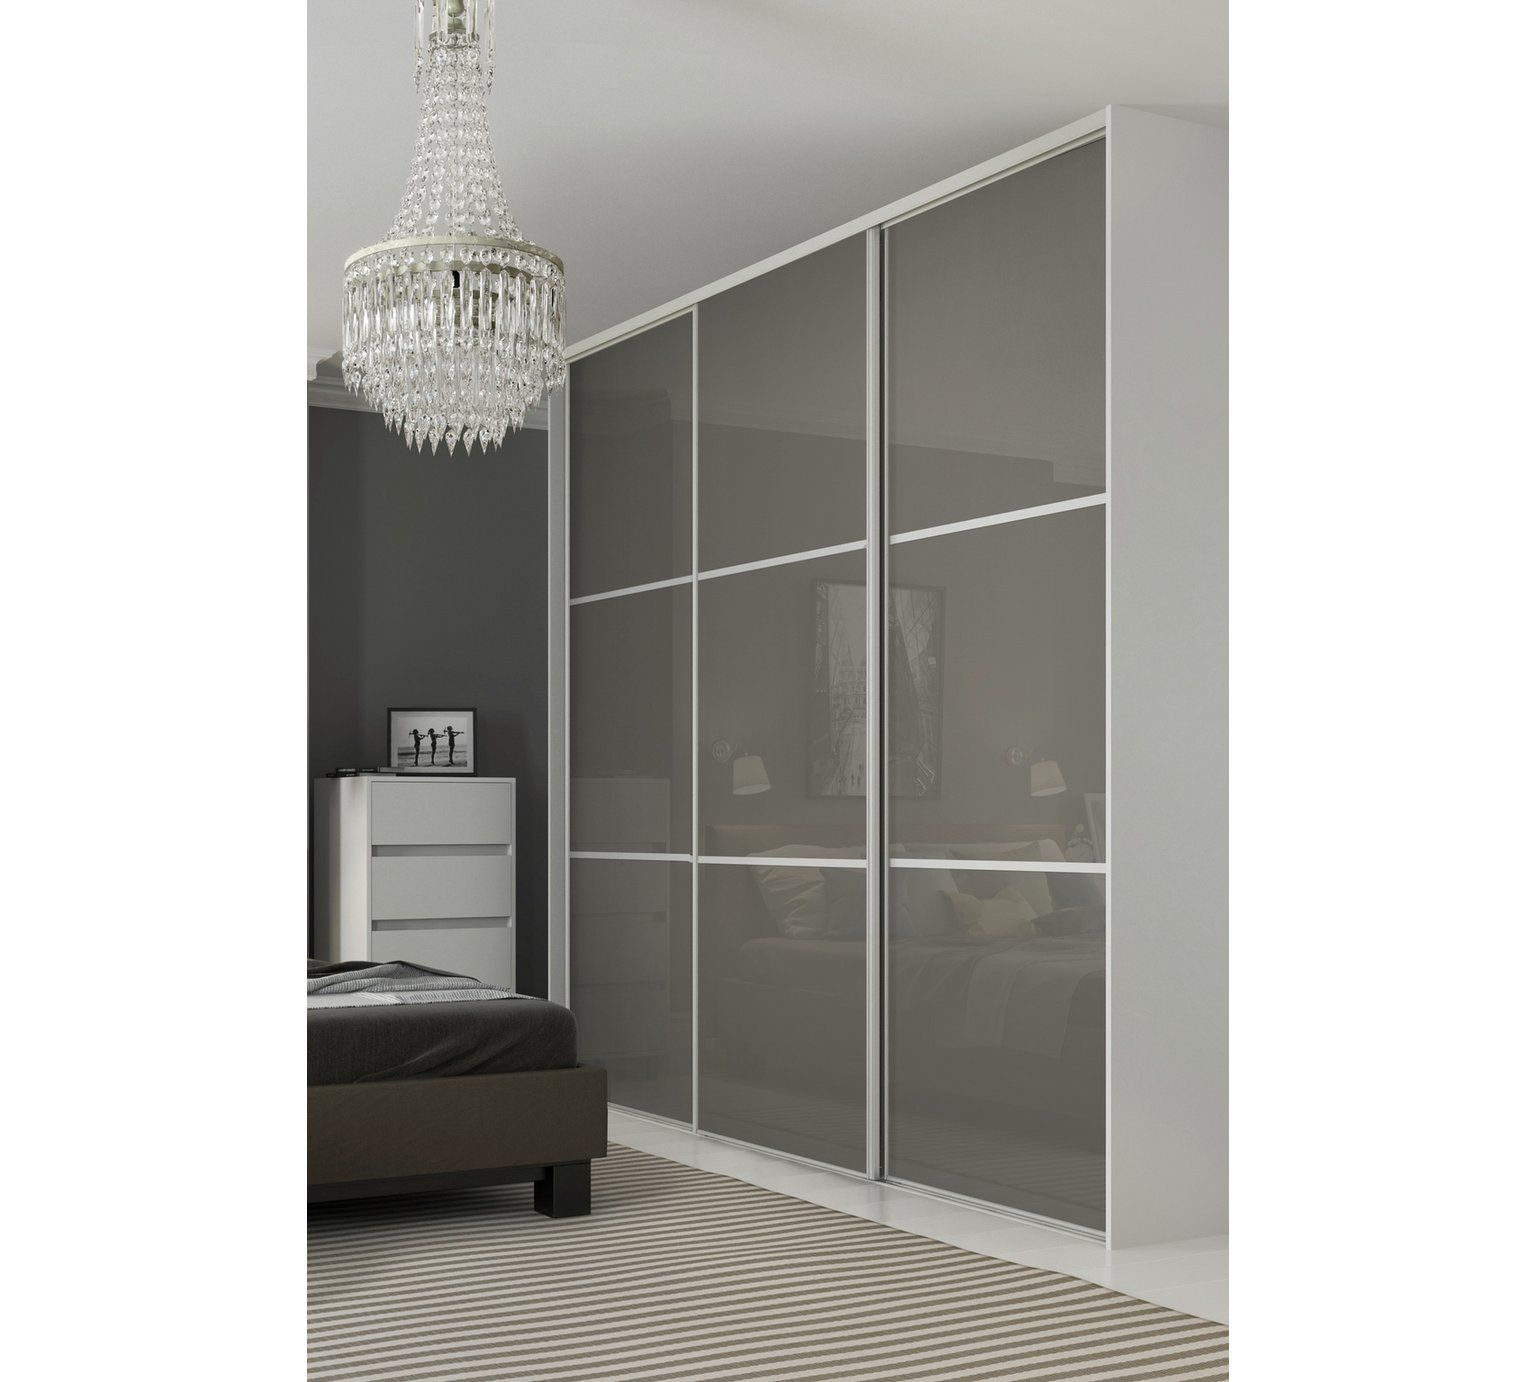 Buy Sliding Wardrobe Door W610mm 3 Panel Cappuccino Glass At Argos